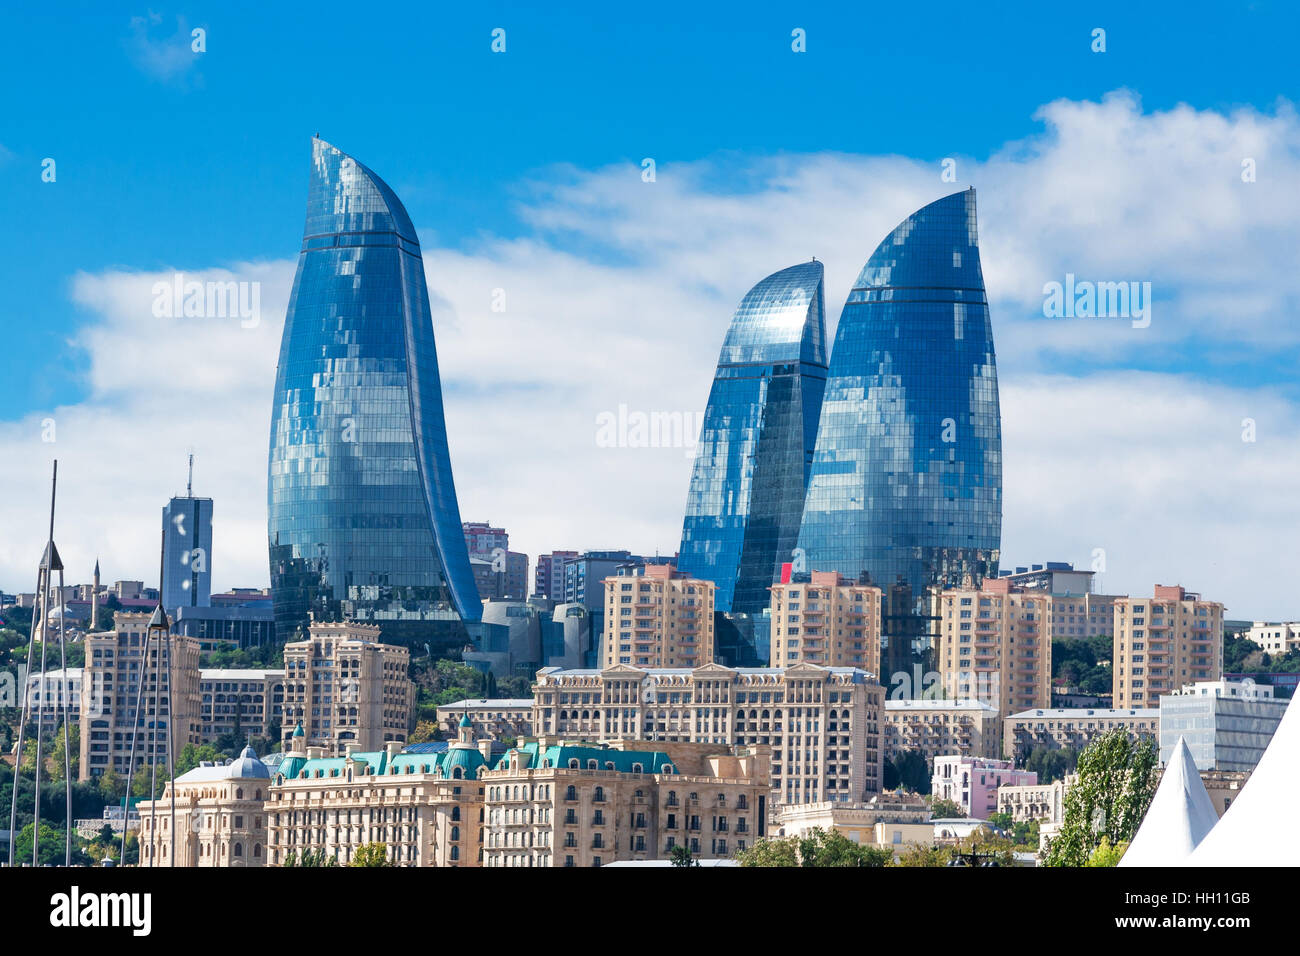 Baku, Azerbaijan - October 2, 2016: Flame towers in the cityscape. Panoramic view of Baku - the capital of Azerbaijan - Stock Image